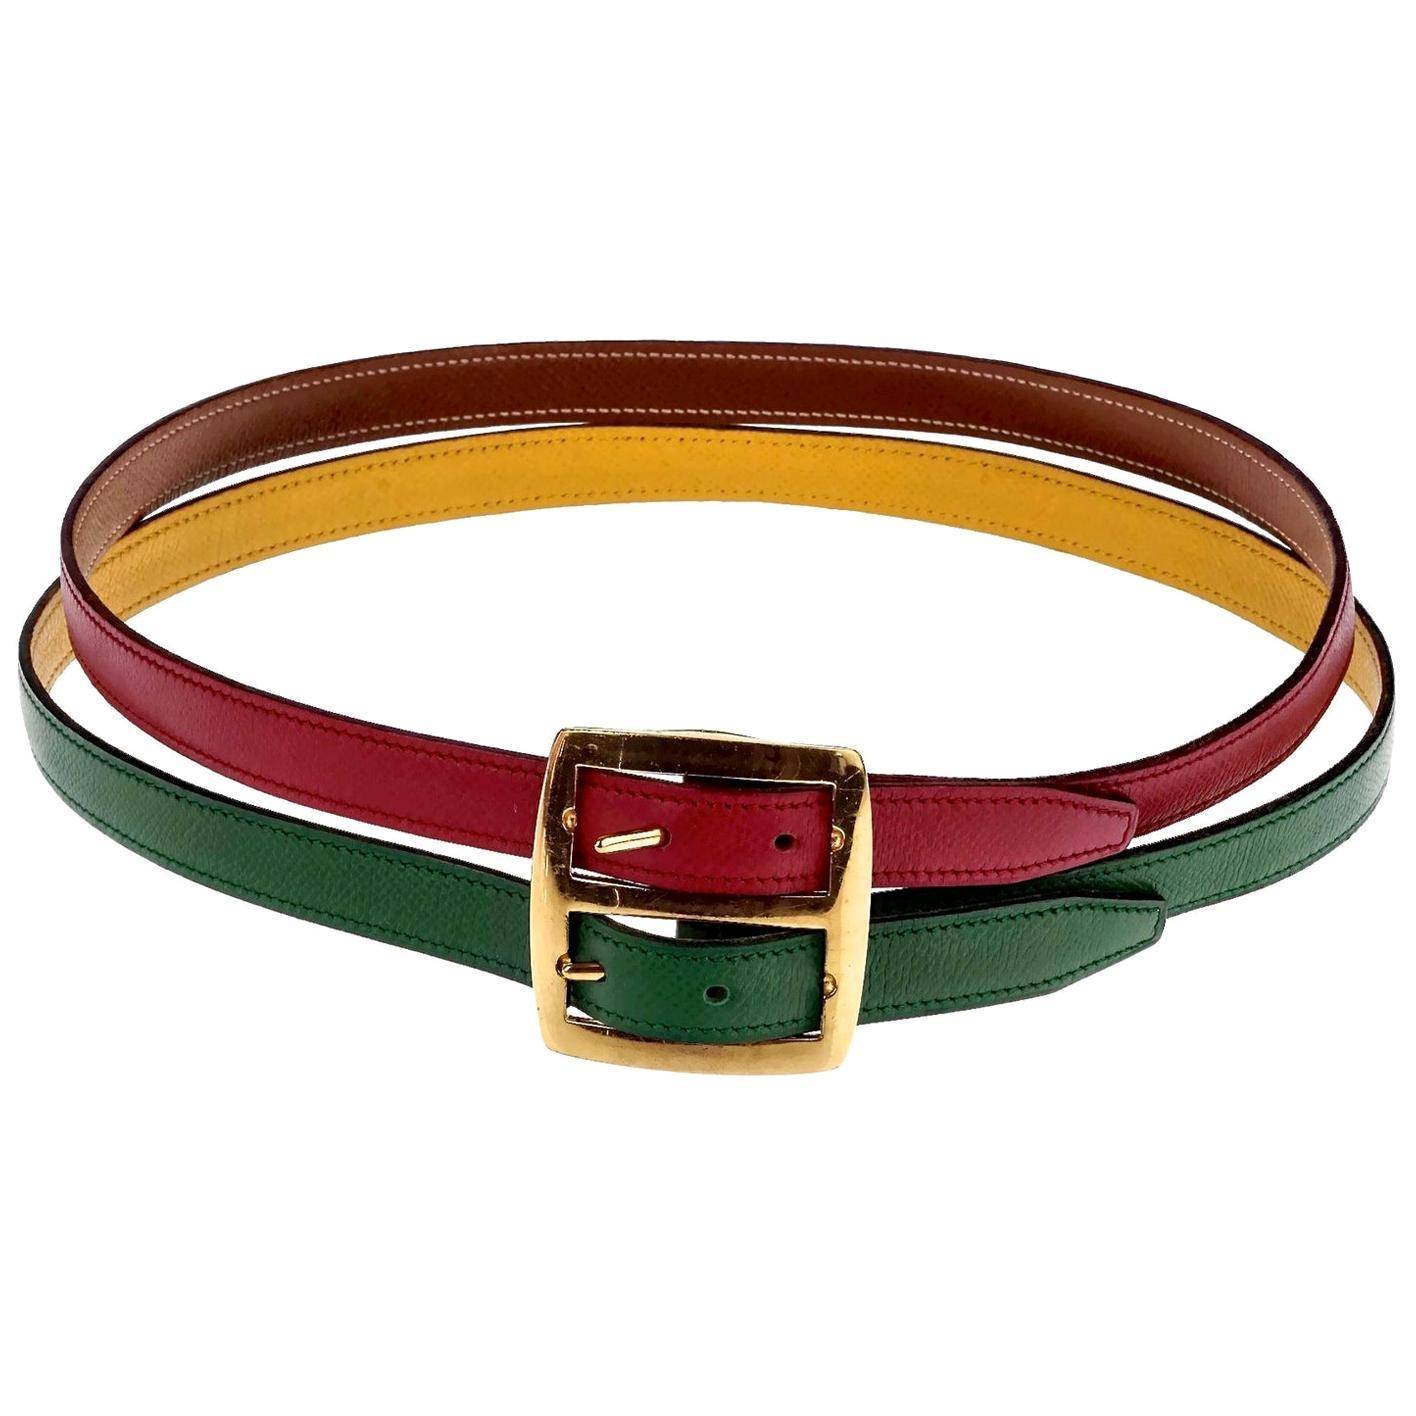 Vintage HERMES Reversible Pop Color Double Strap Belt